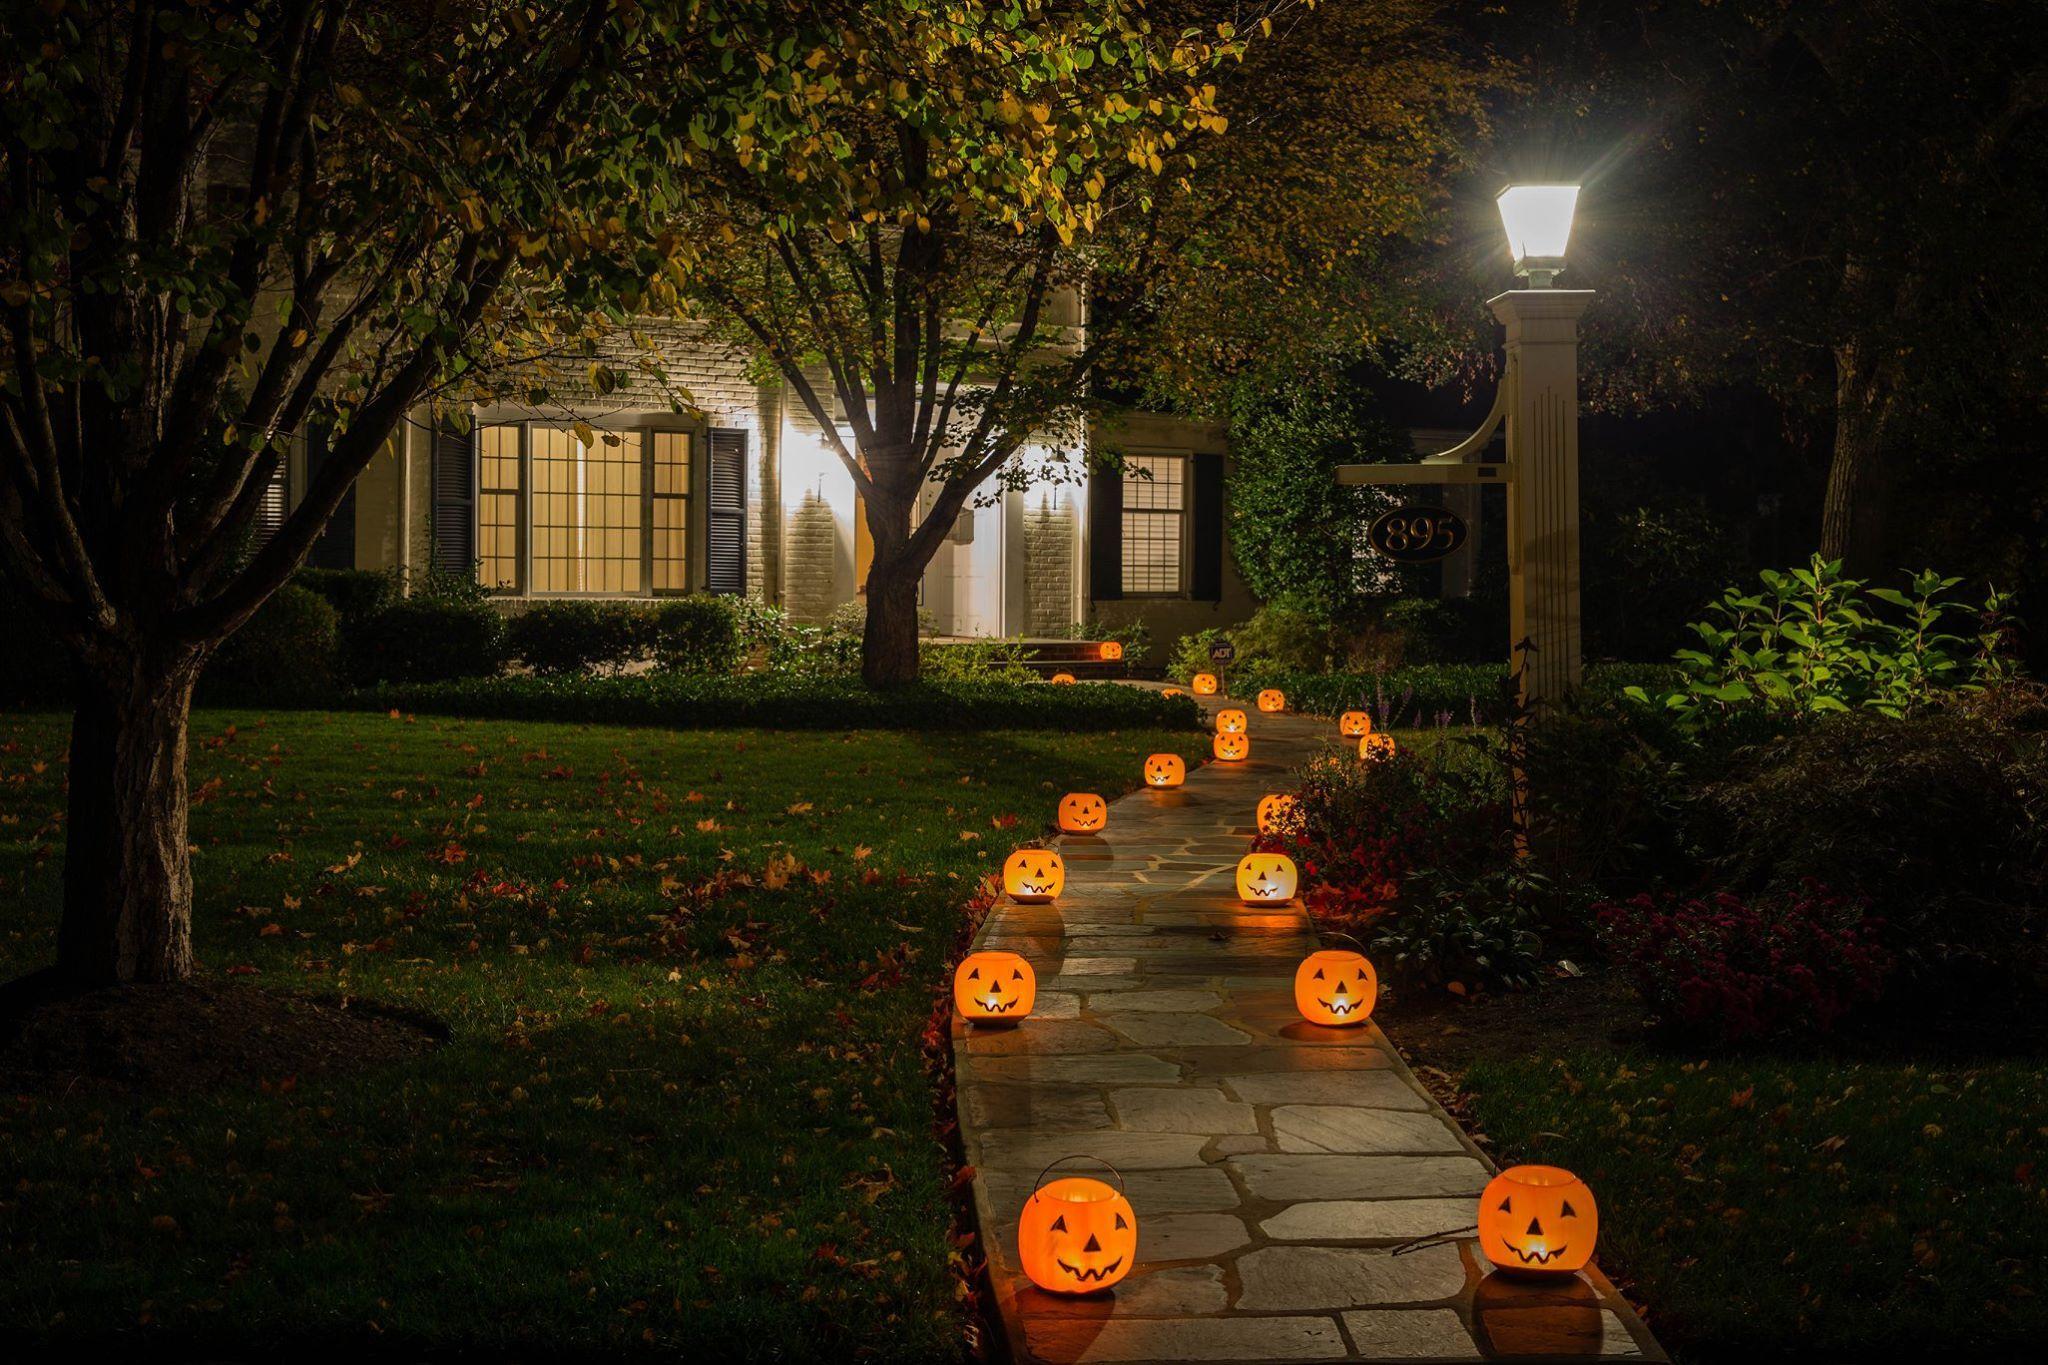 71ed19151a131fa34f00_Halloween.jpg